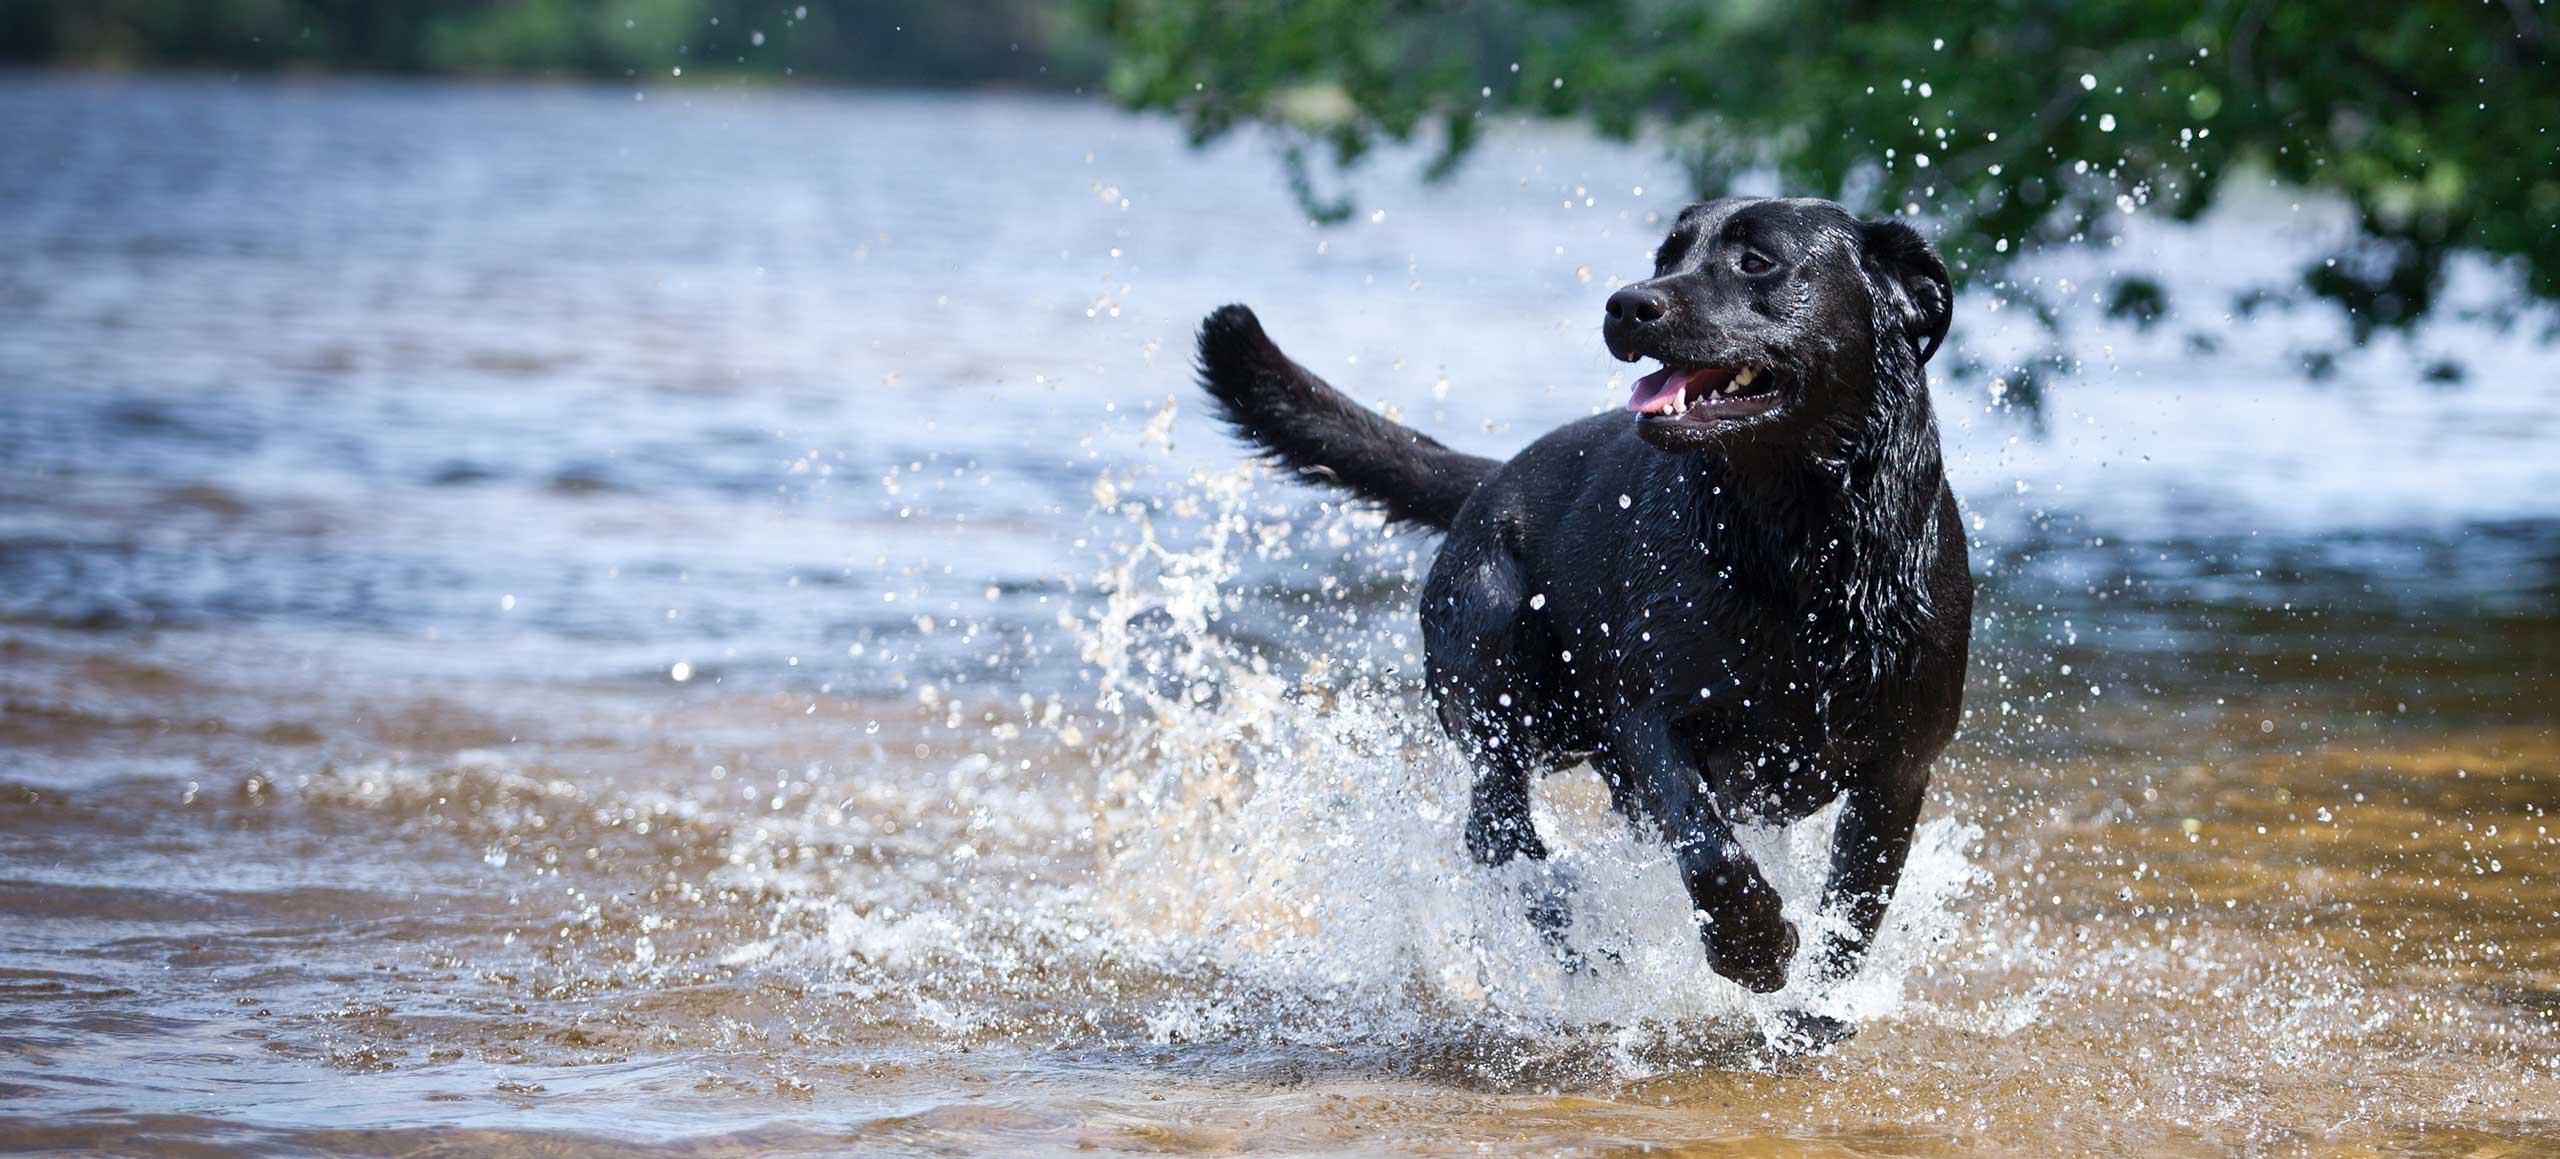 Autarky -hondenvoeding - volwassen honden - kip - zalm